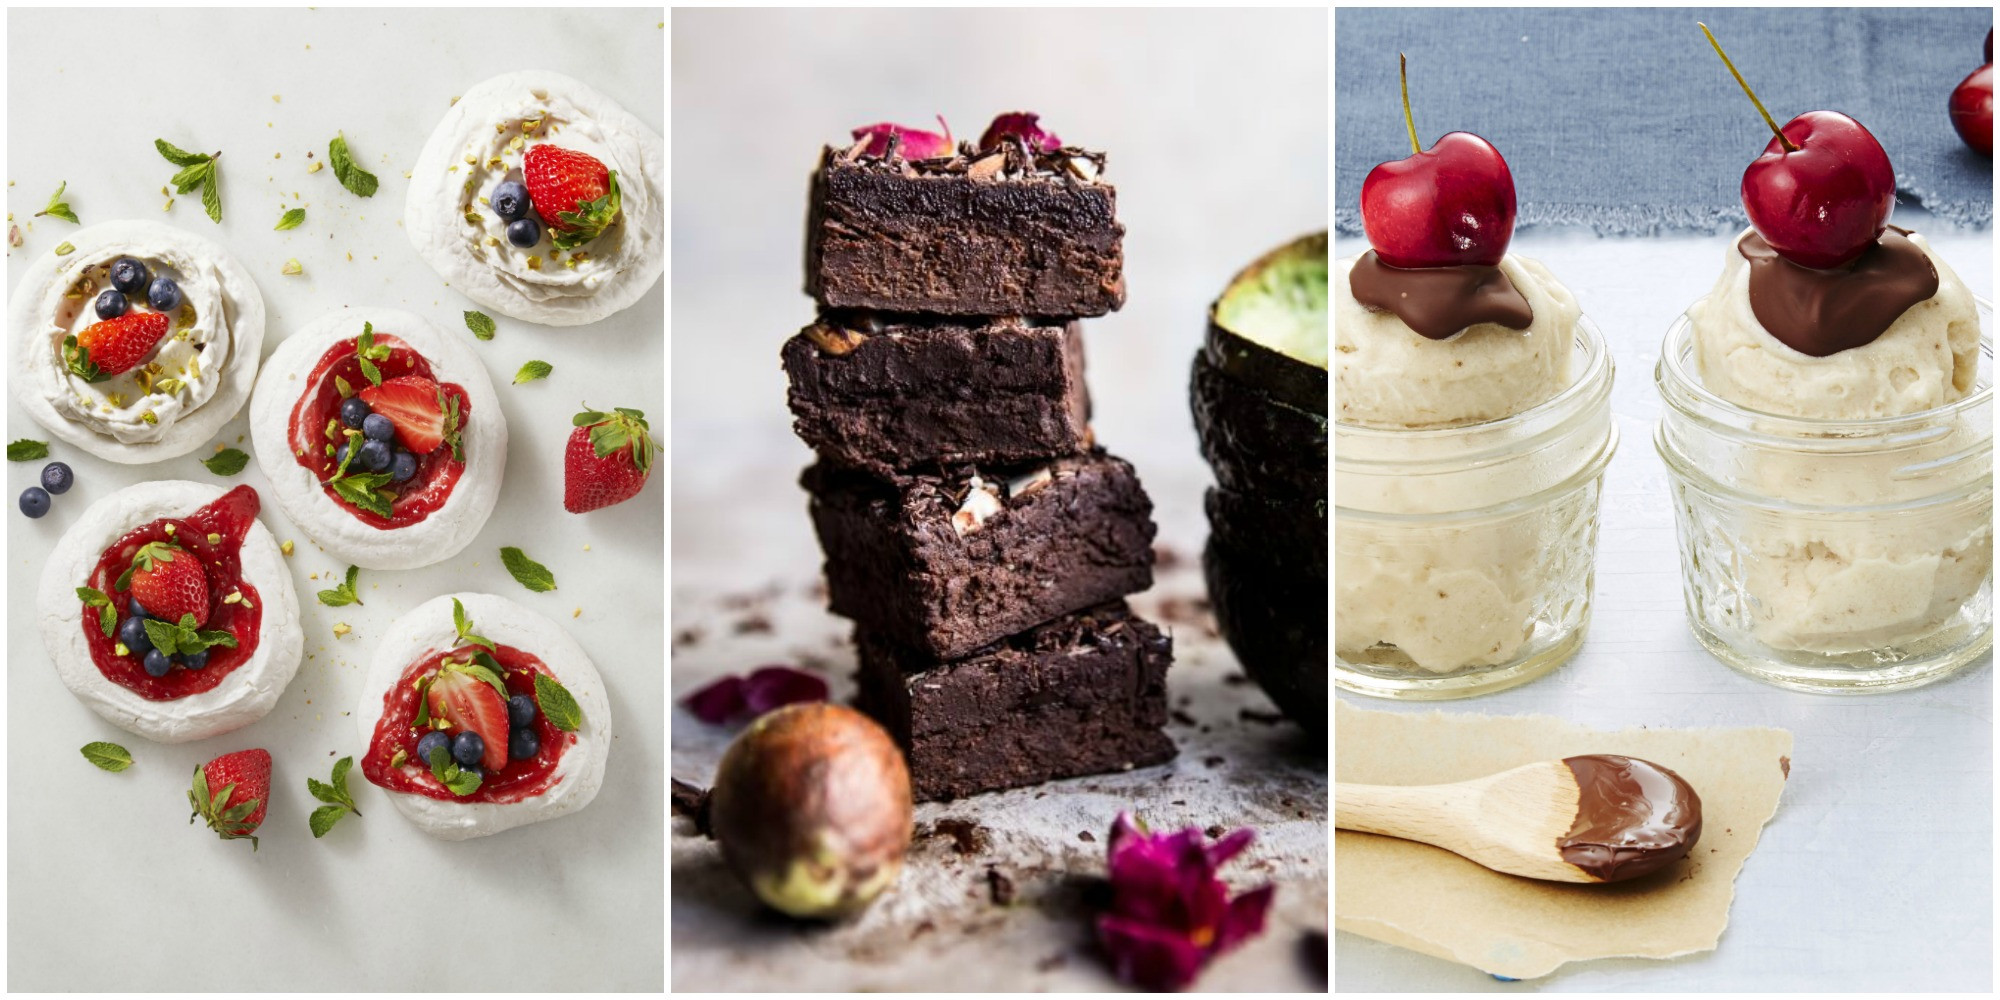 Healthy Dessert Ideas  15 Best Healthy Dessert Recipes Easy Ideas for Low